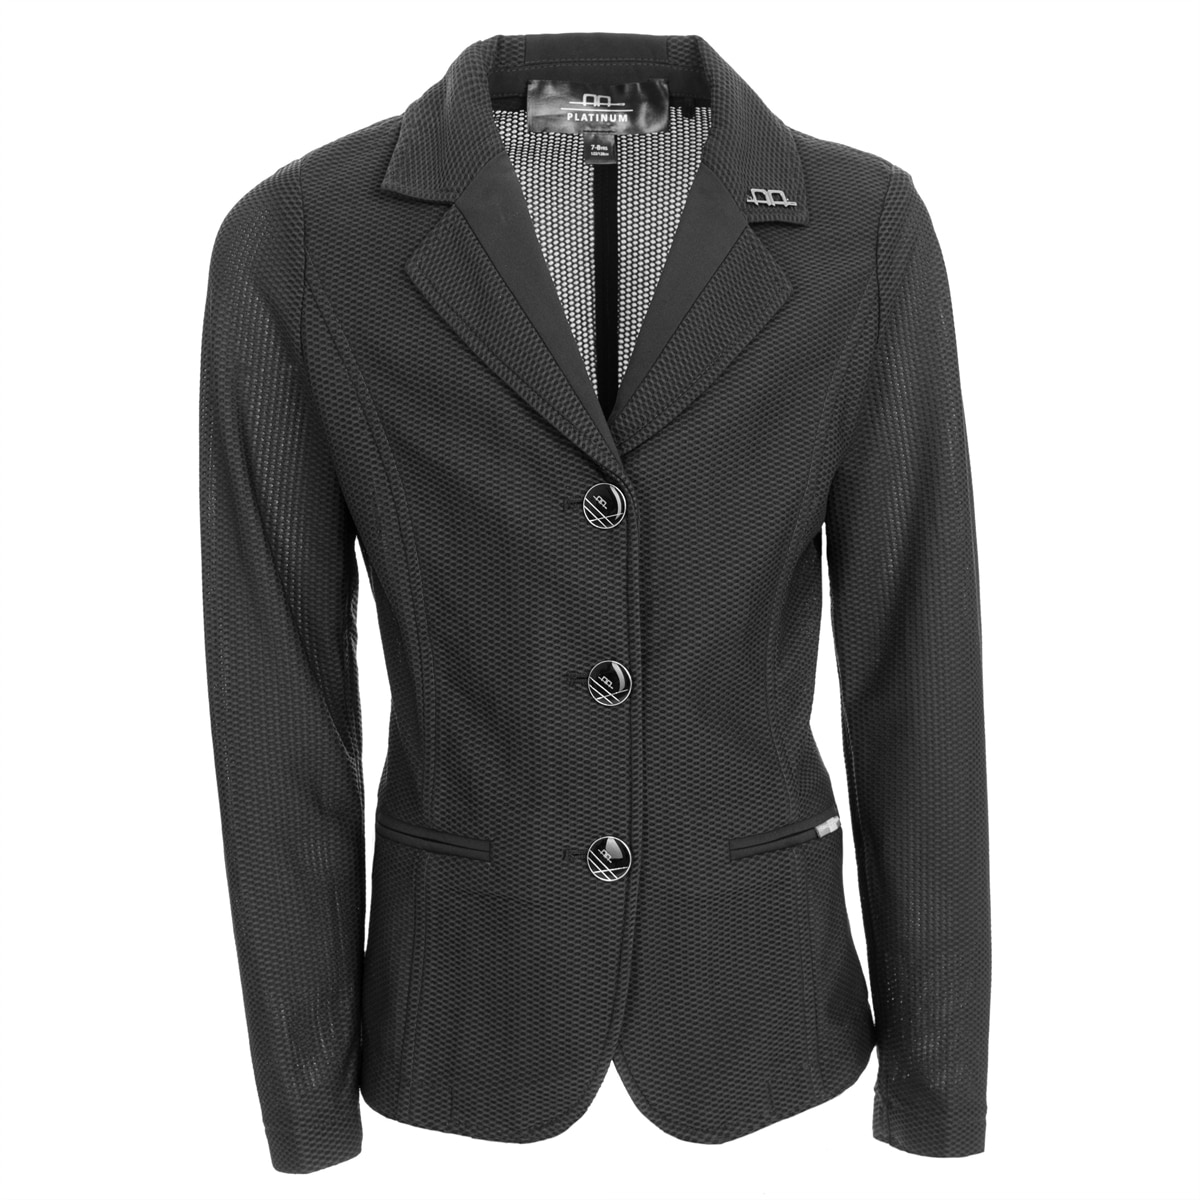 Childs Kerrits KIDS Competitors Koat Show Jacket All Sizes Black w//White